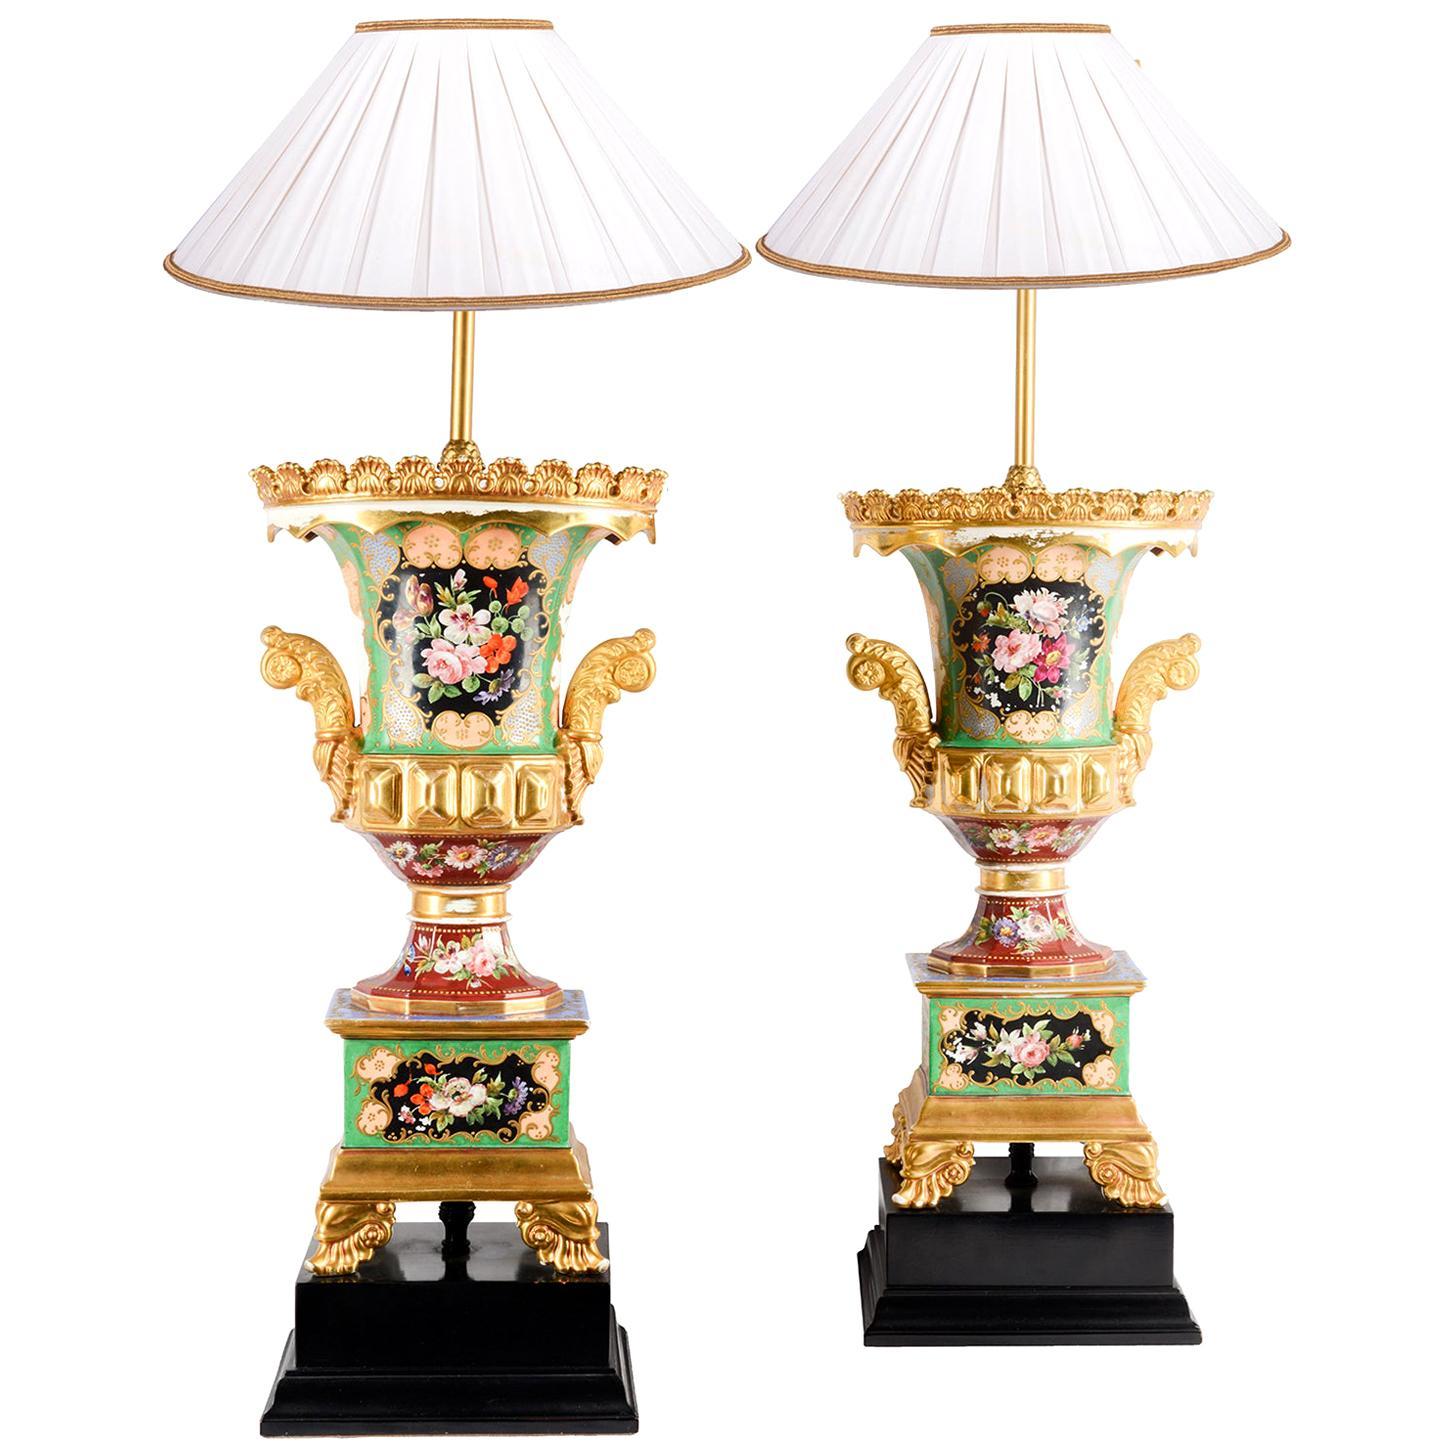 Pair of 19th Century Paris Porcelain Urn / Lamps